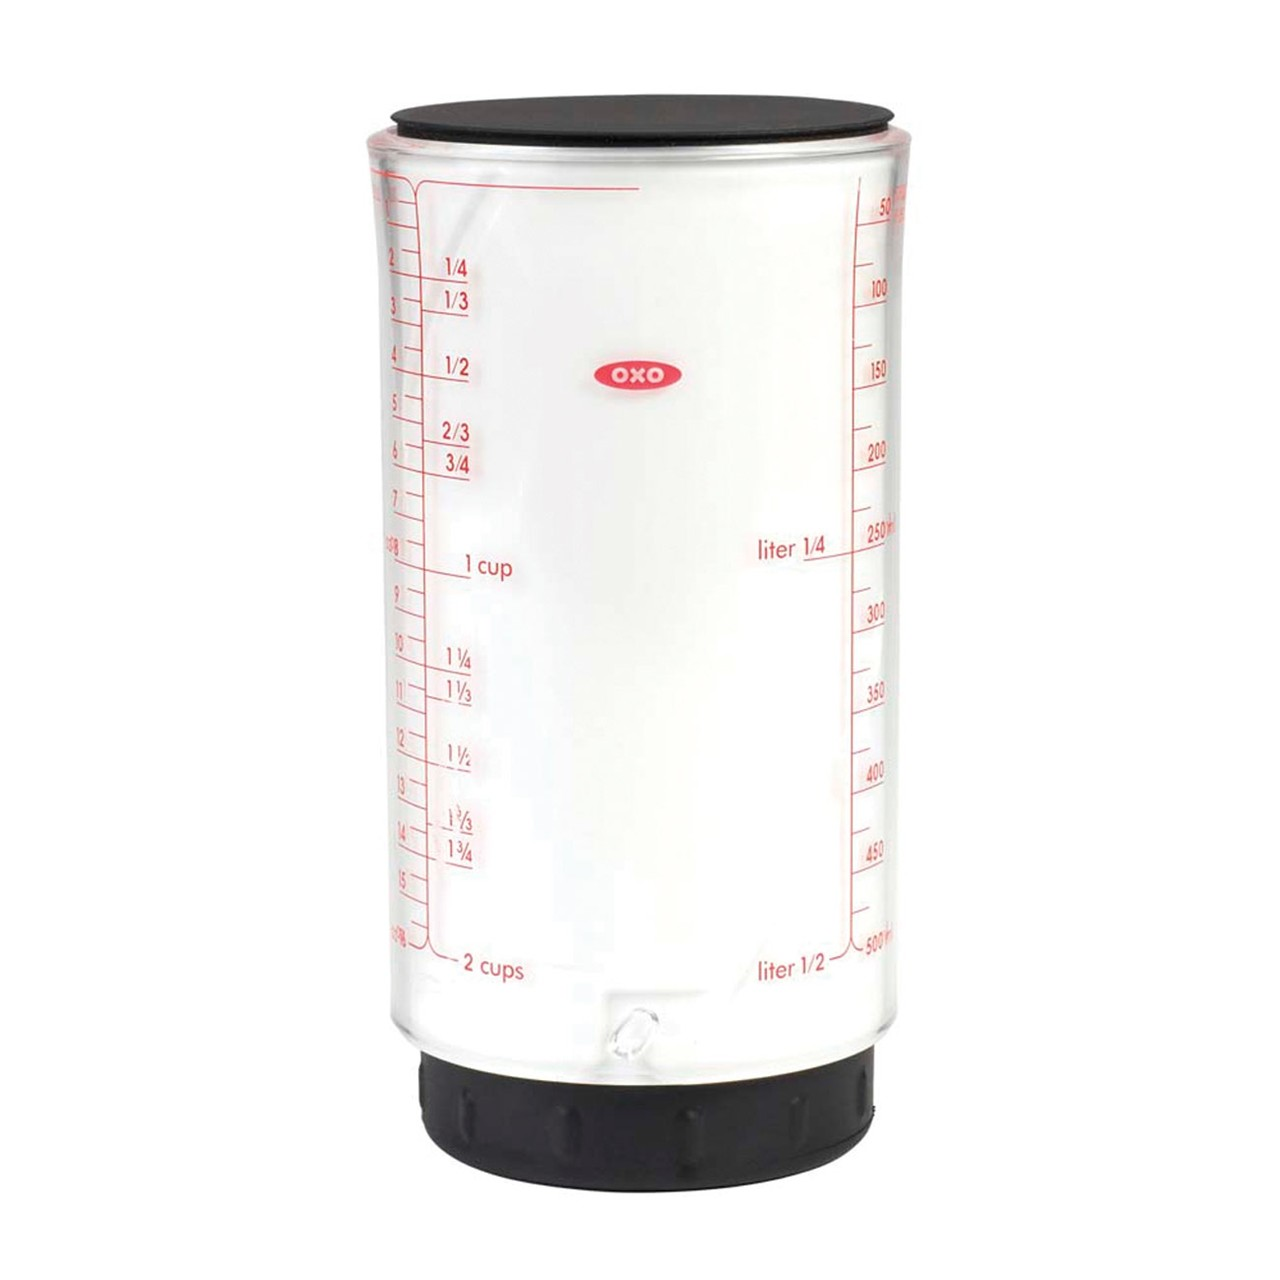 Maxiaids 2 Cup Adjustable Measuring Cup